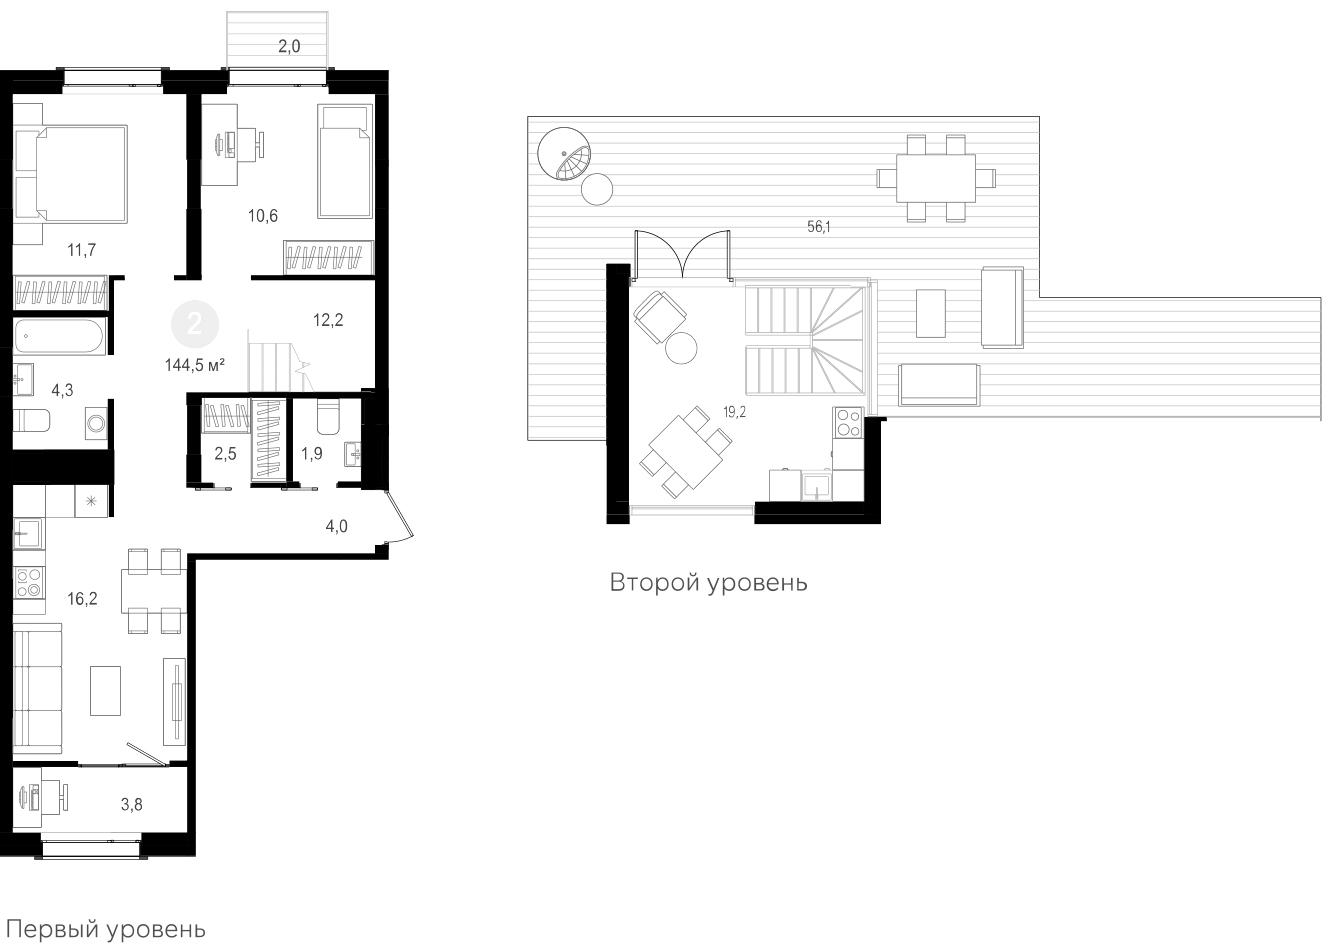 3Е-к.кв, 144.4 м²